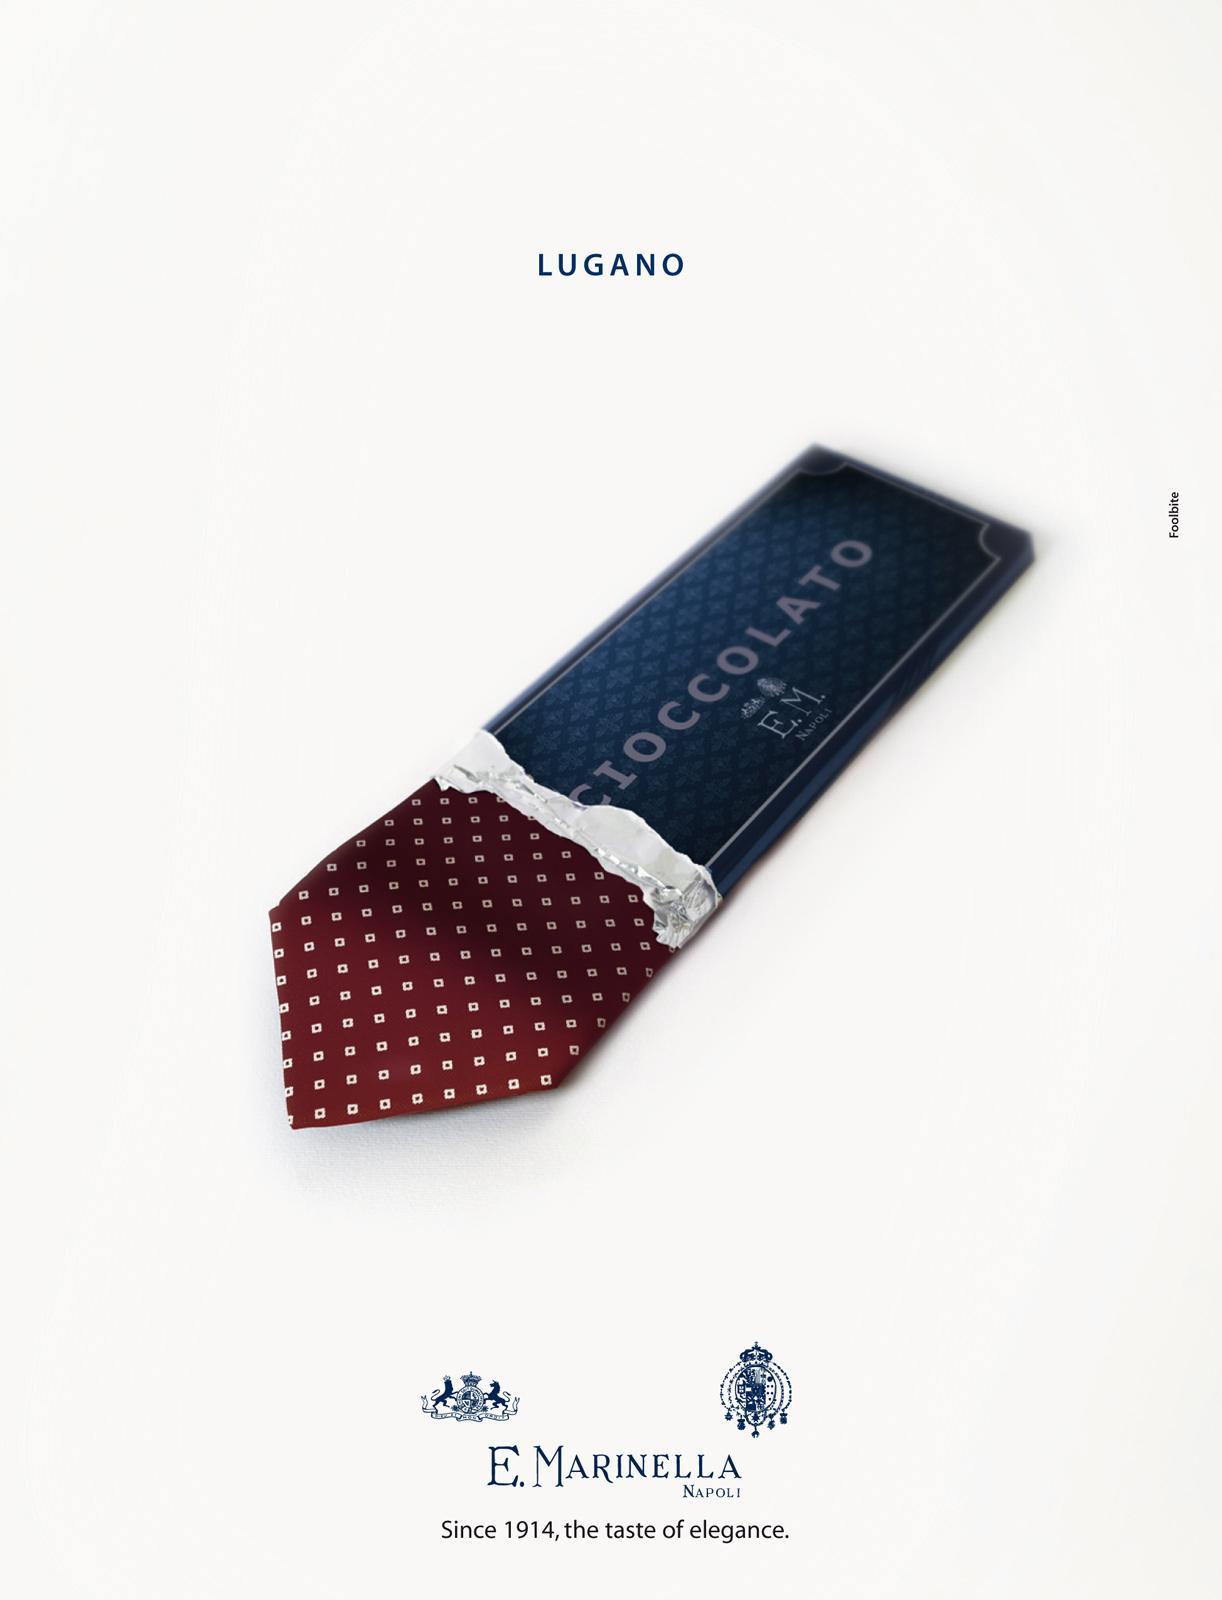 Marinella Print Ad -  Lugano